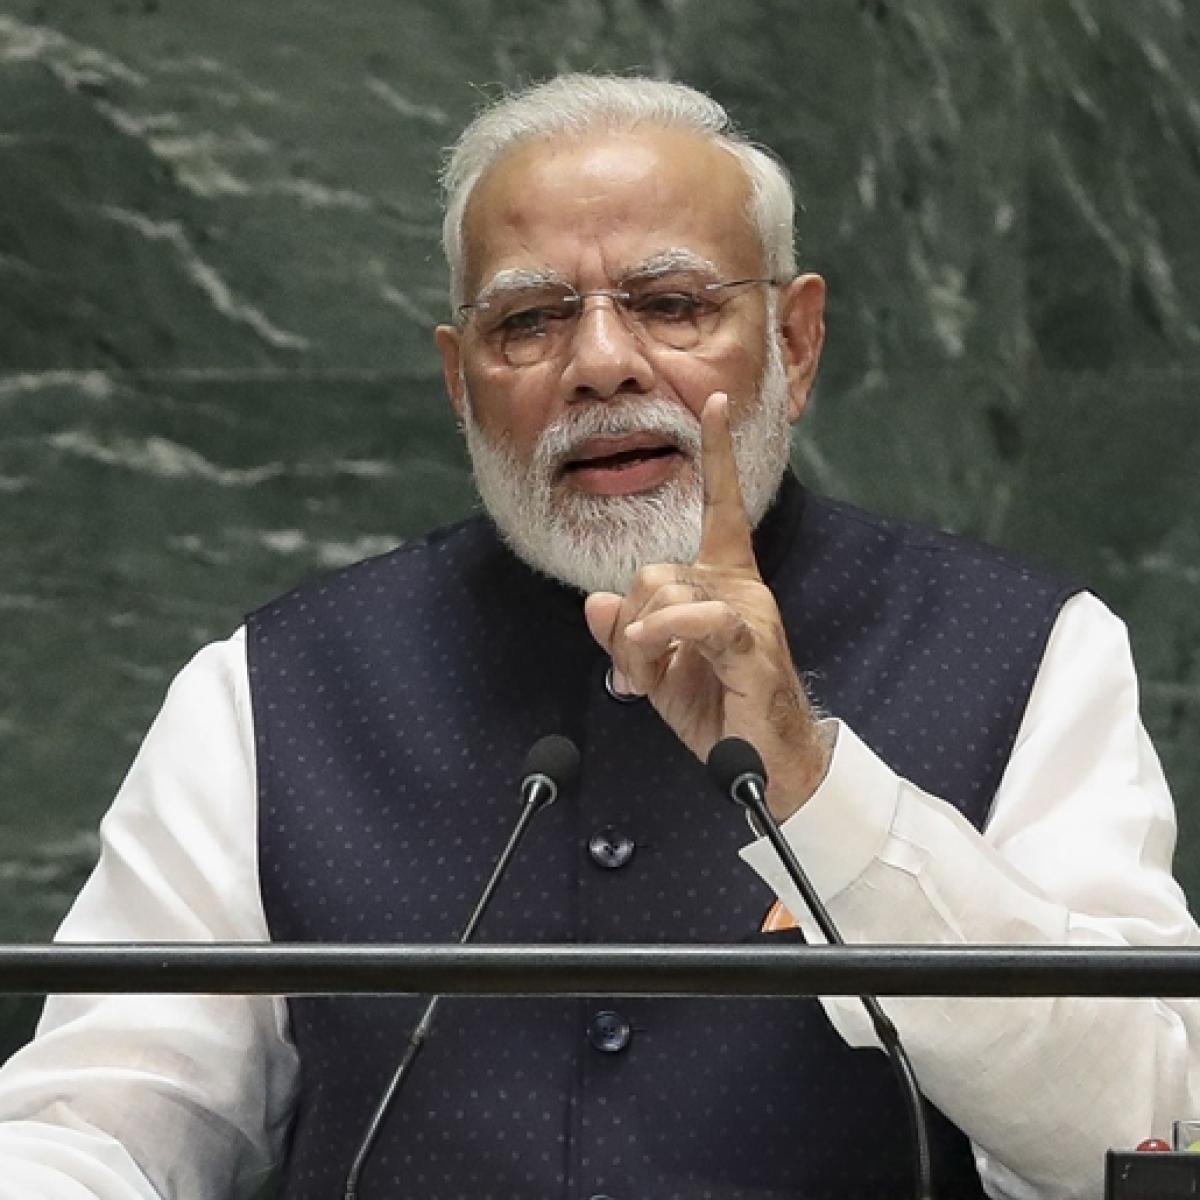 PM Narendra Modi snubs Pakistan in UNGA address, focuses on India's contribution in development and peace